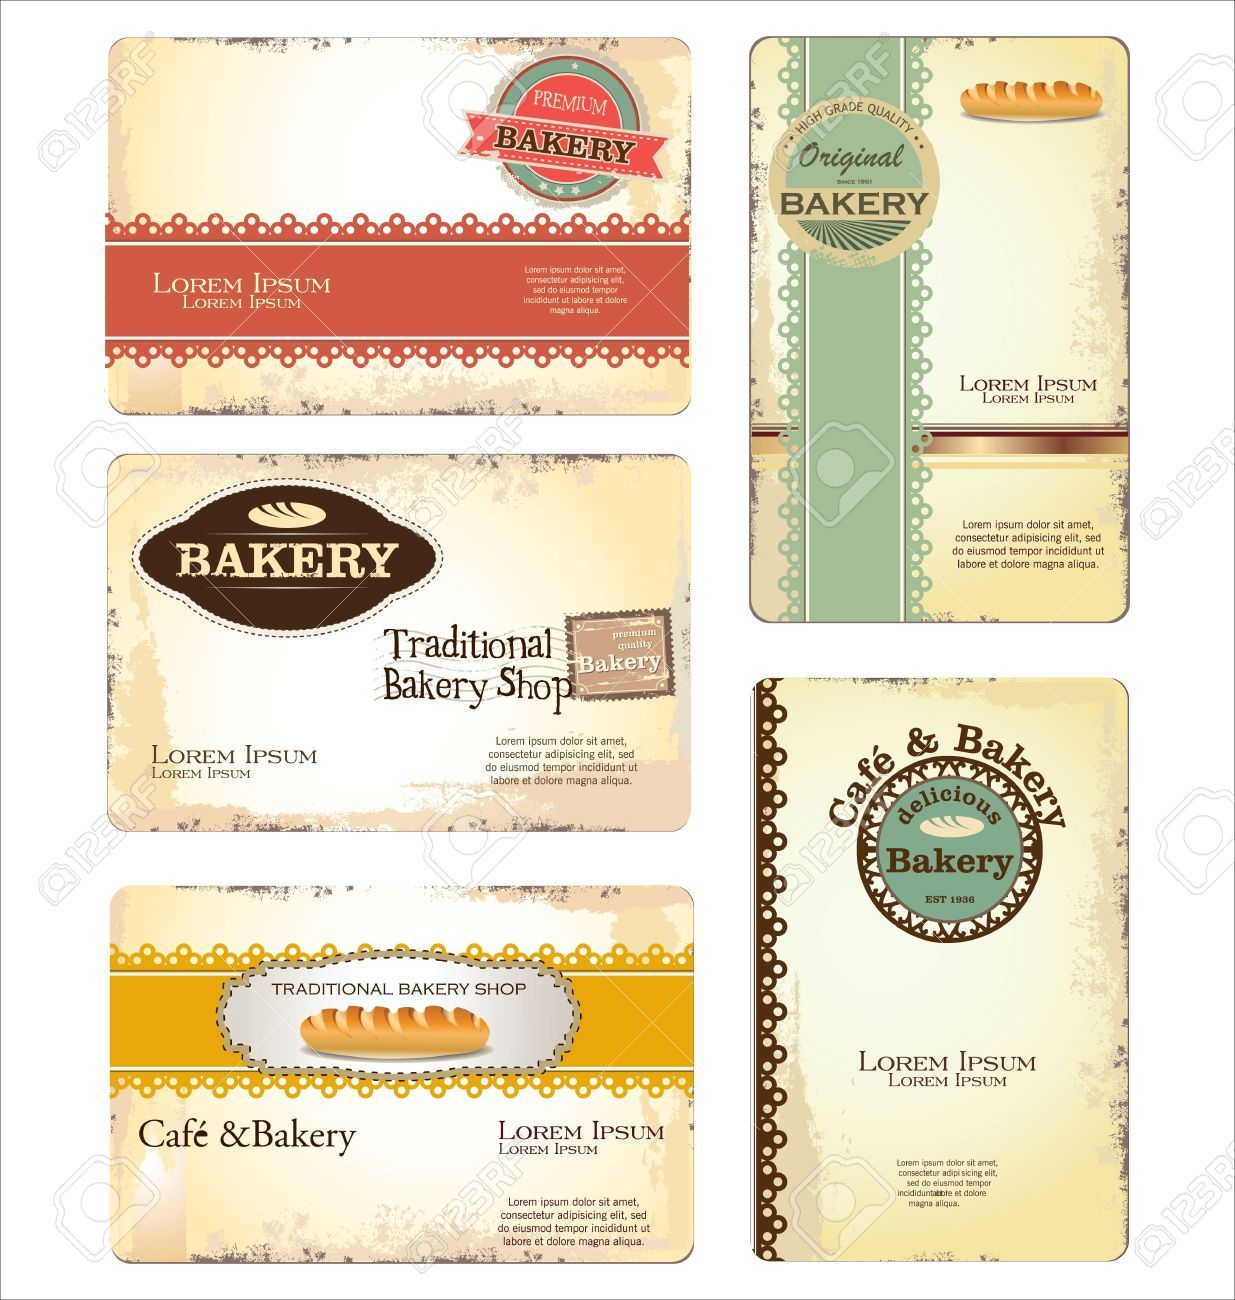 Vintage Bakery Business Cards Set Of 5 Card